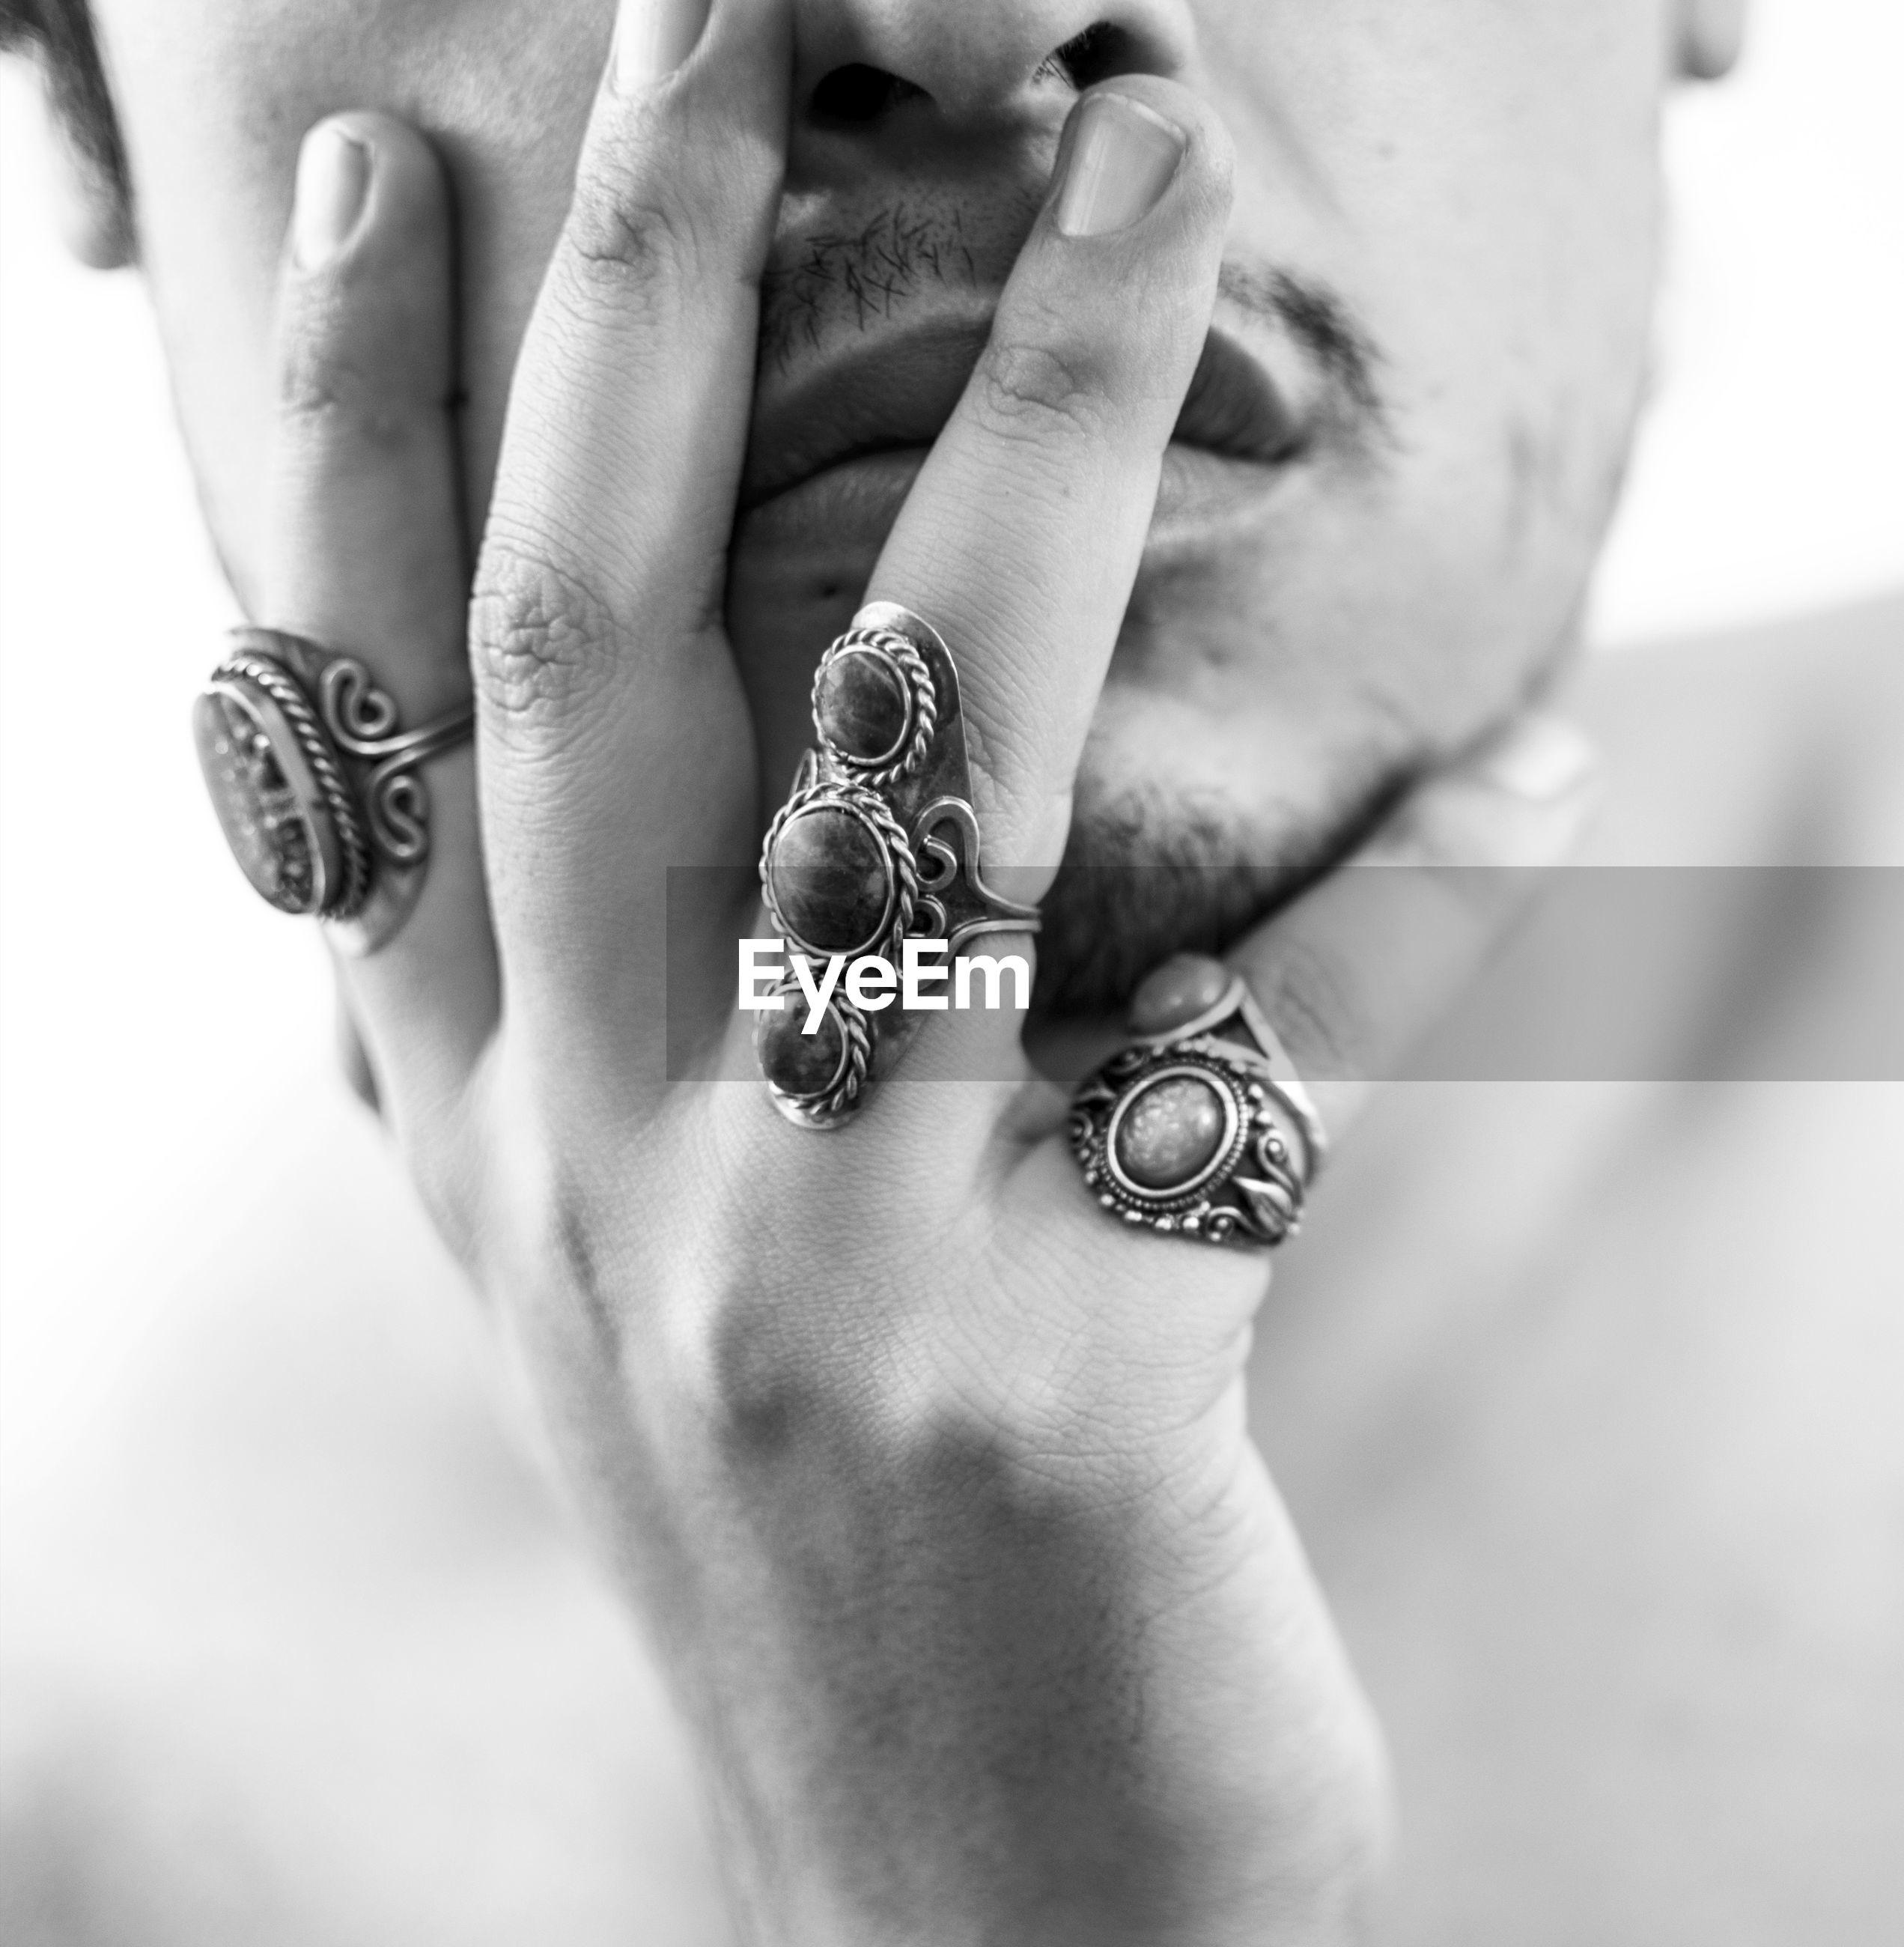 Midsection of shirtless man wearing rings